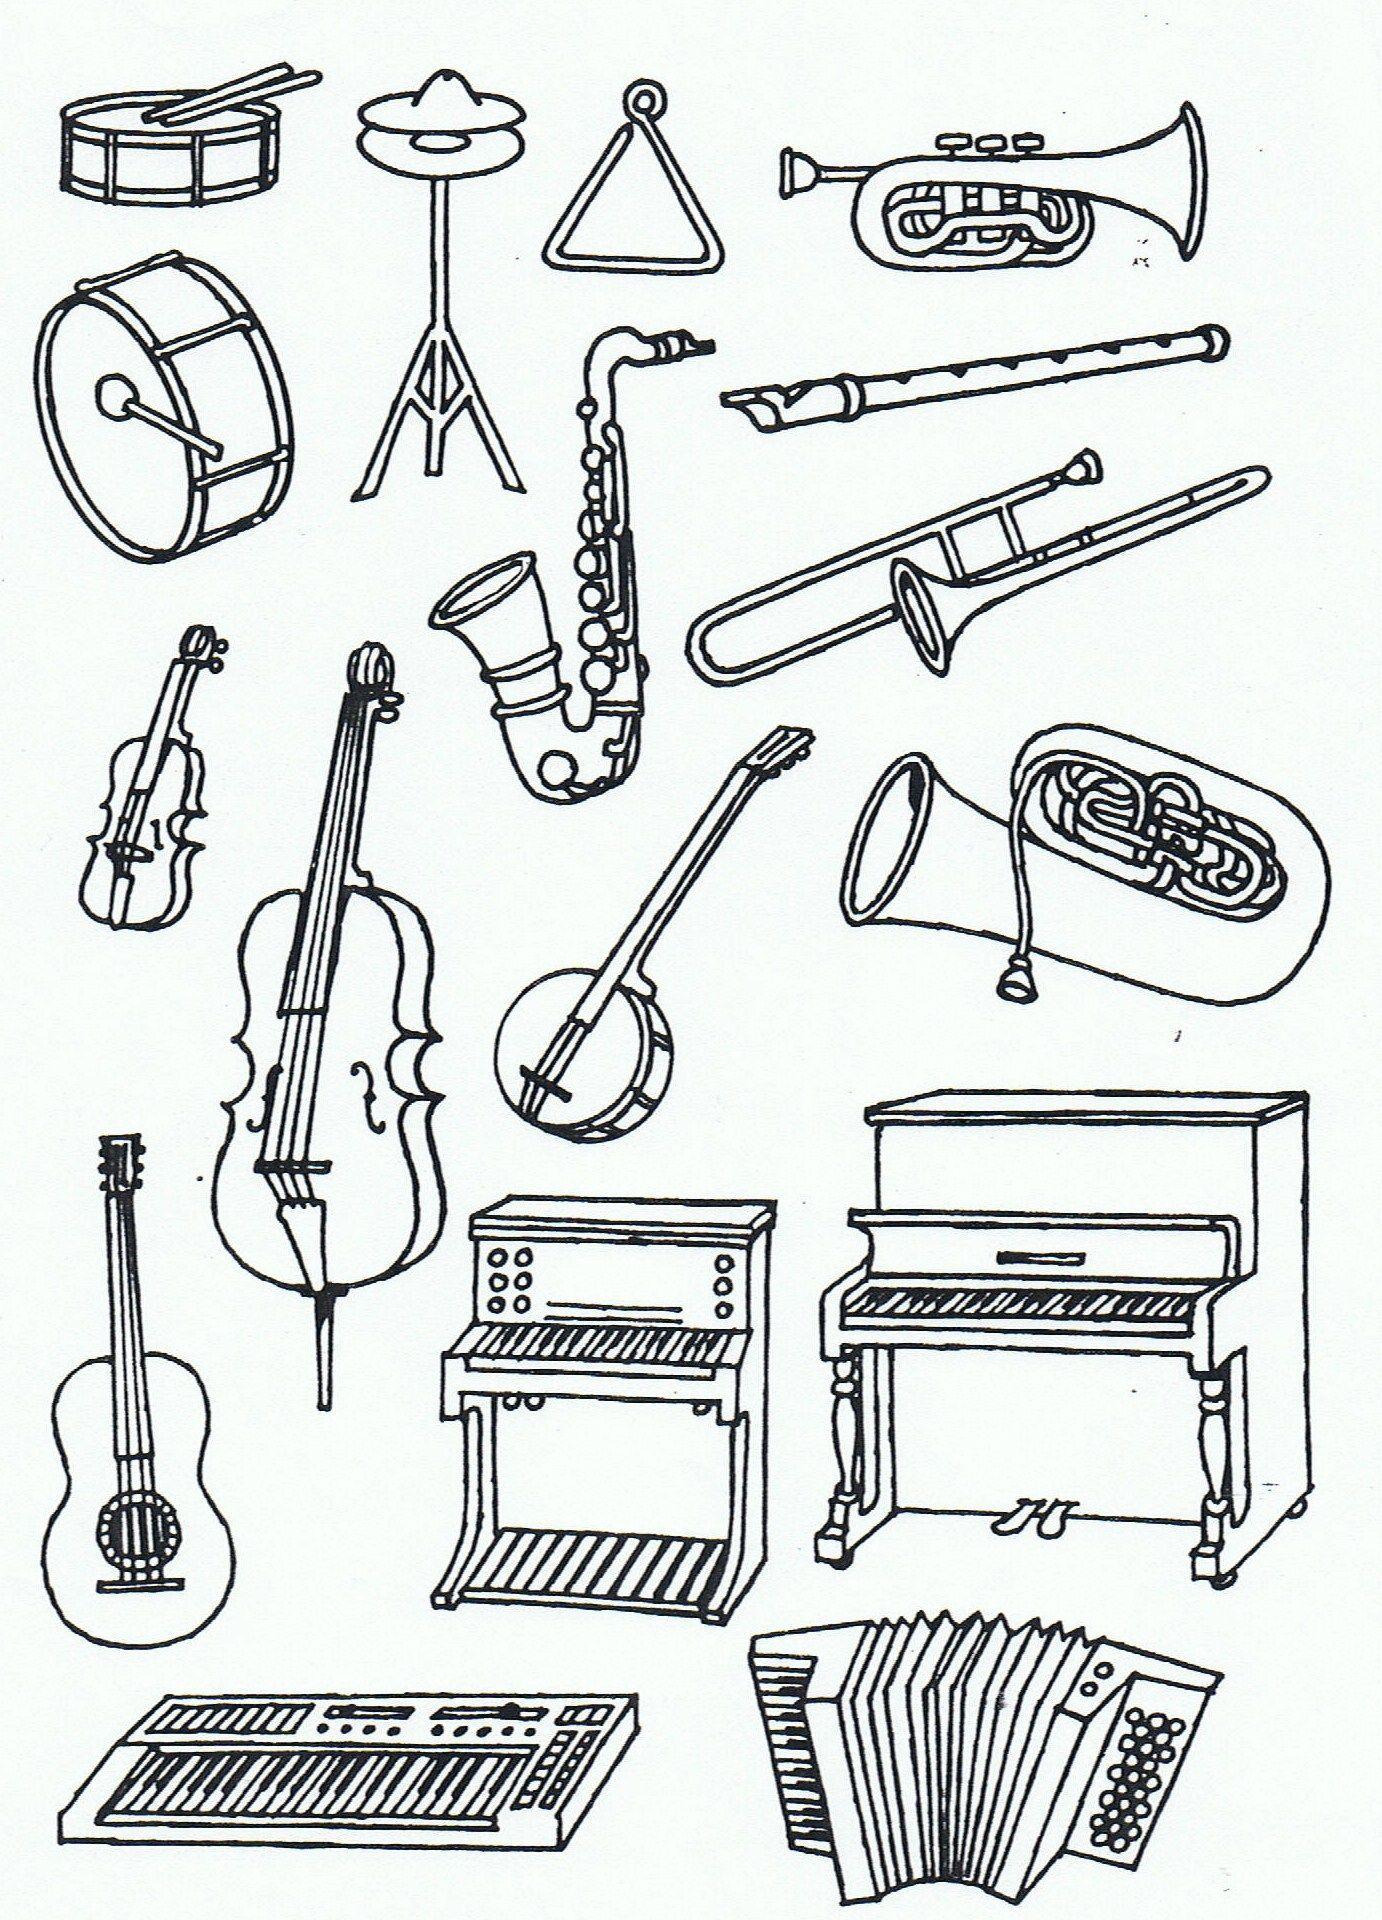 446639629716ffe62178fd98f49f6184 Jpg 1 382 1 920 Pixels Music Worksheets Music For Kids Preschool Music Activities